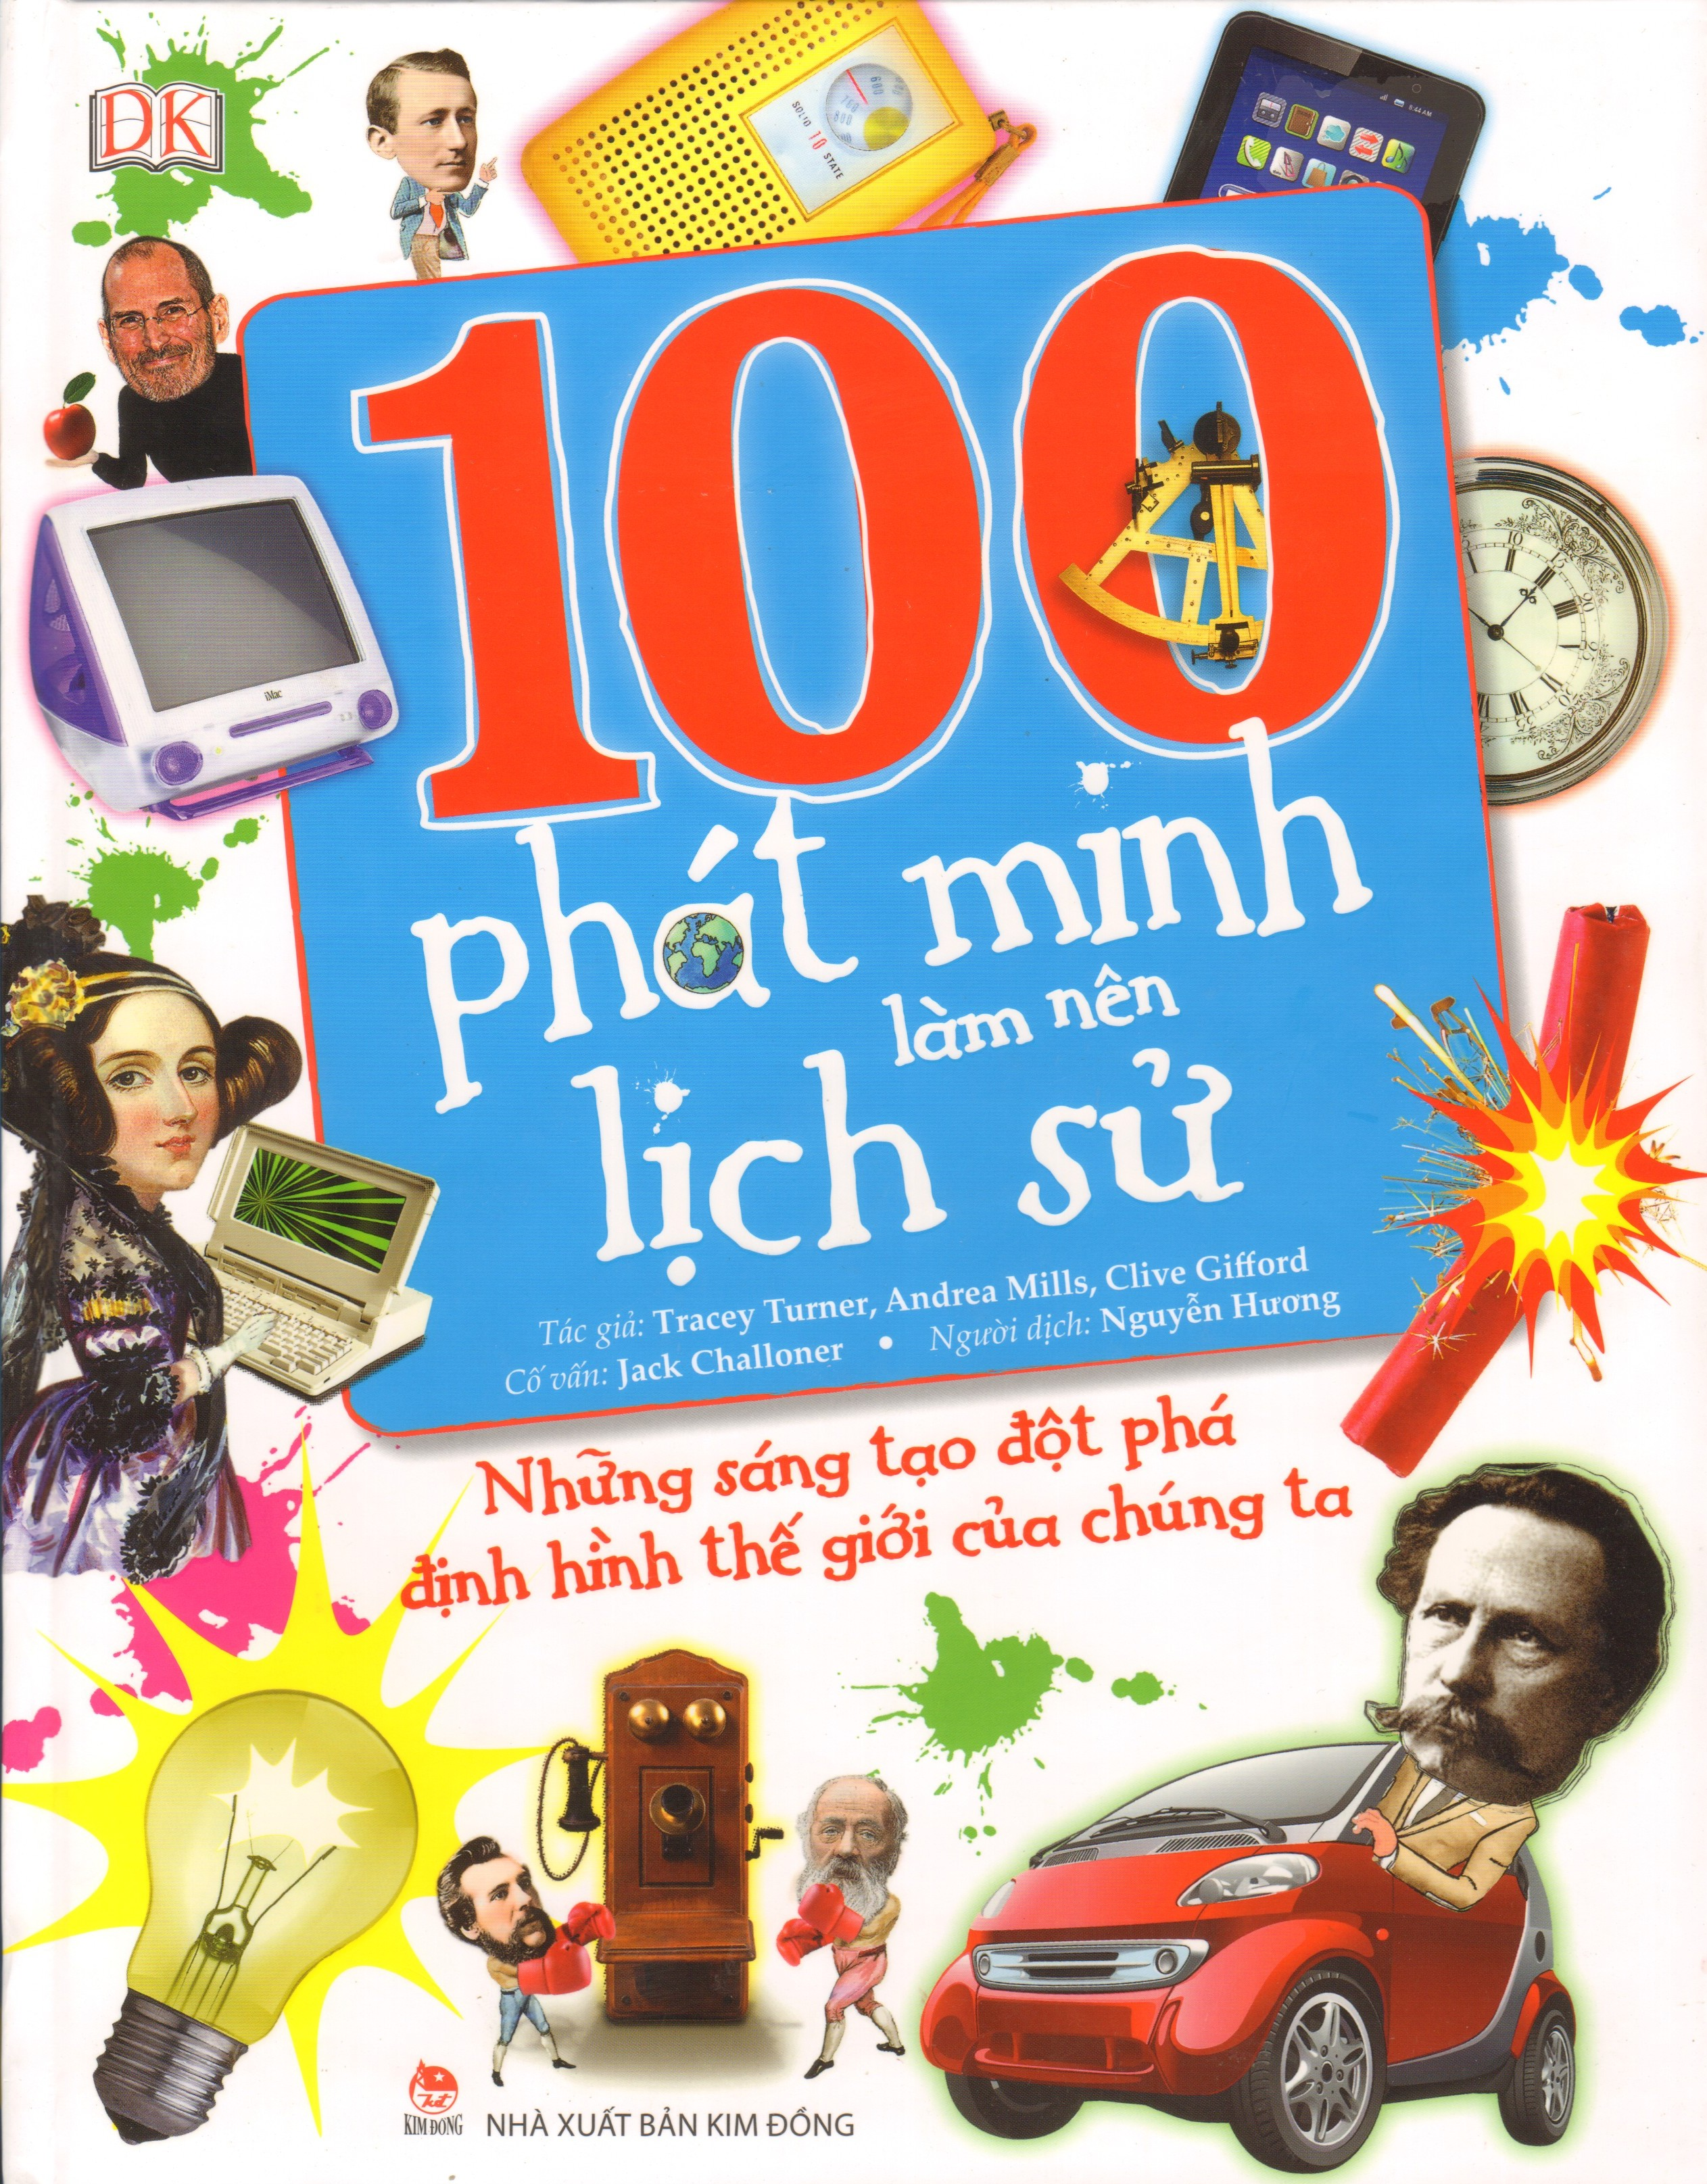 100 Phat minh lam nen lich su